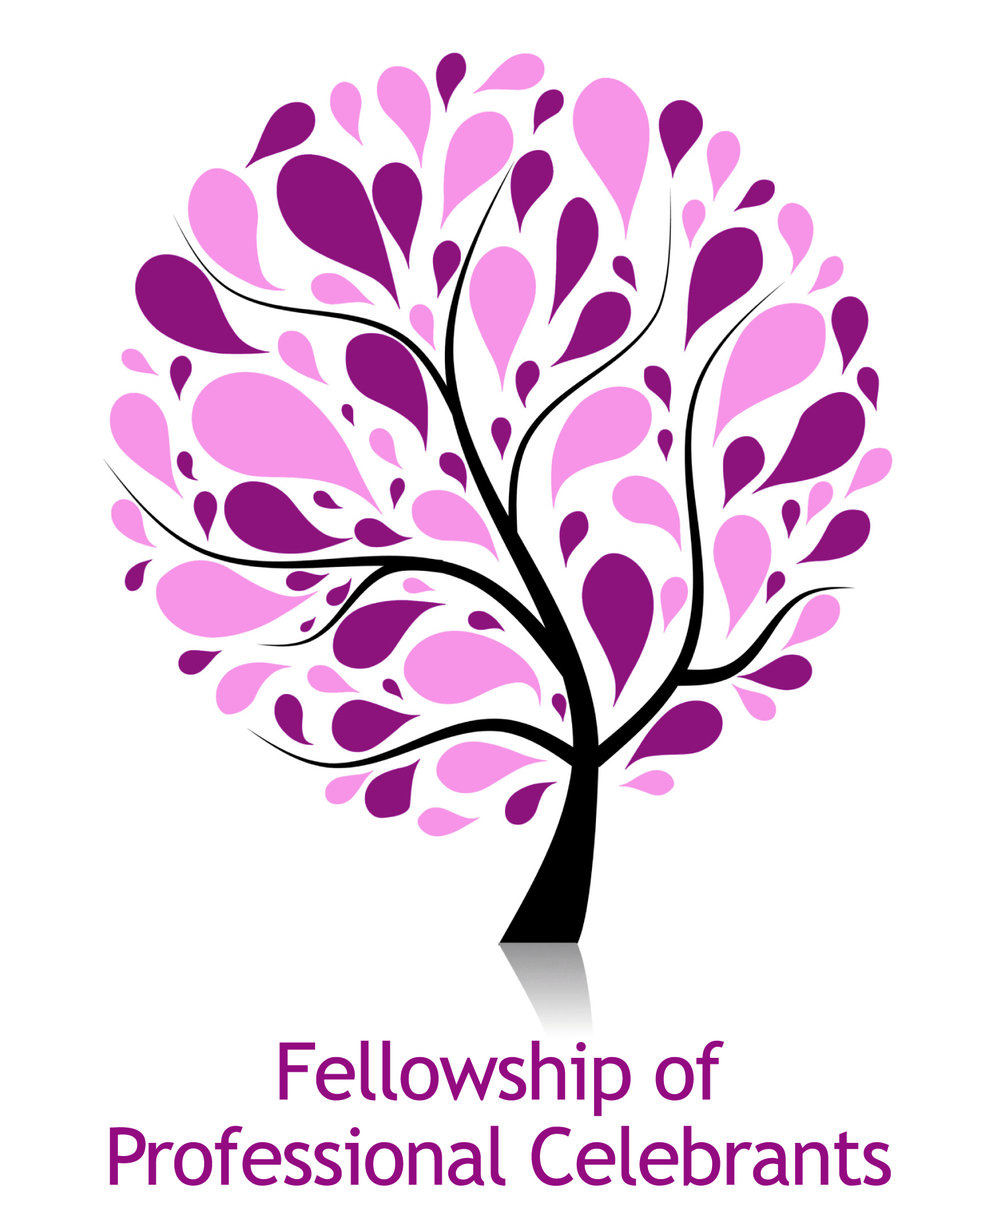 FellowshipofProffessionalCelebrants